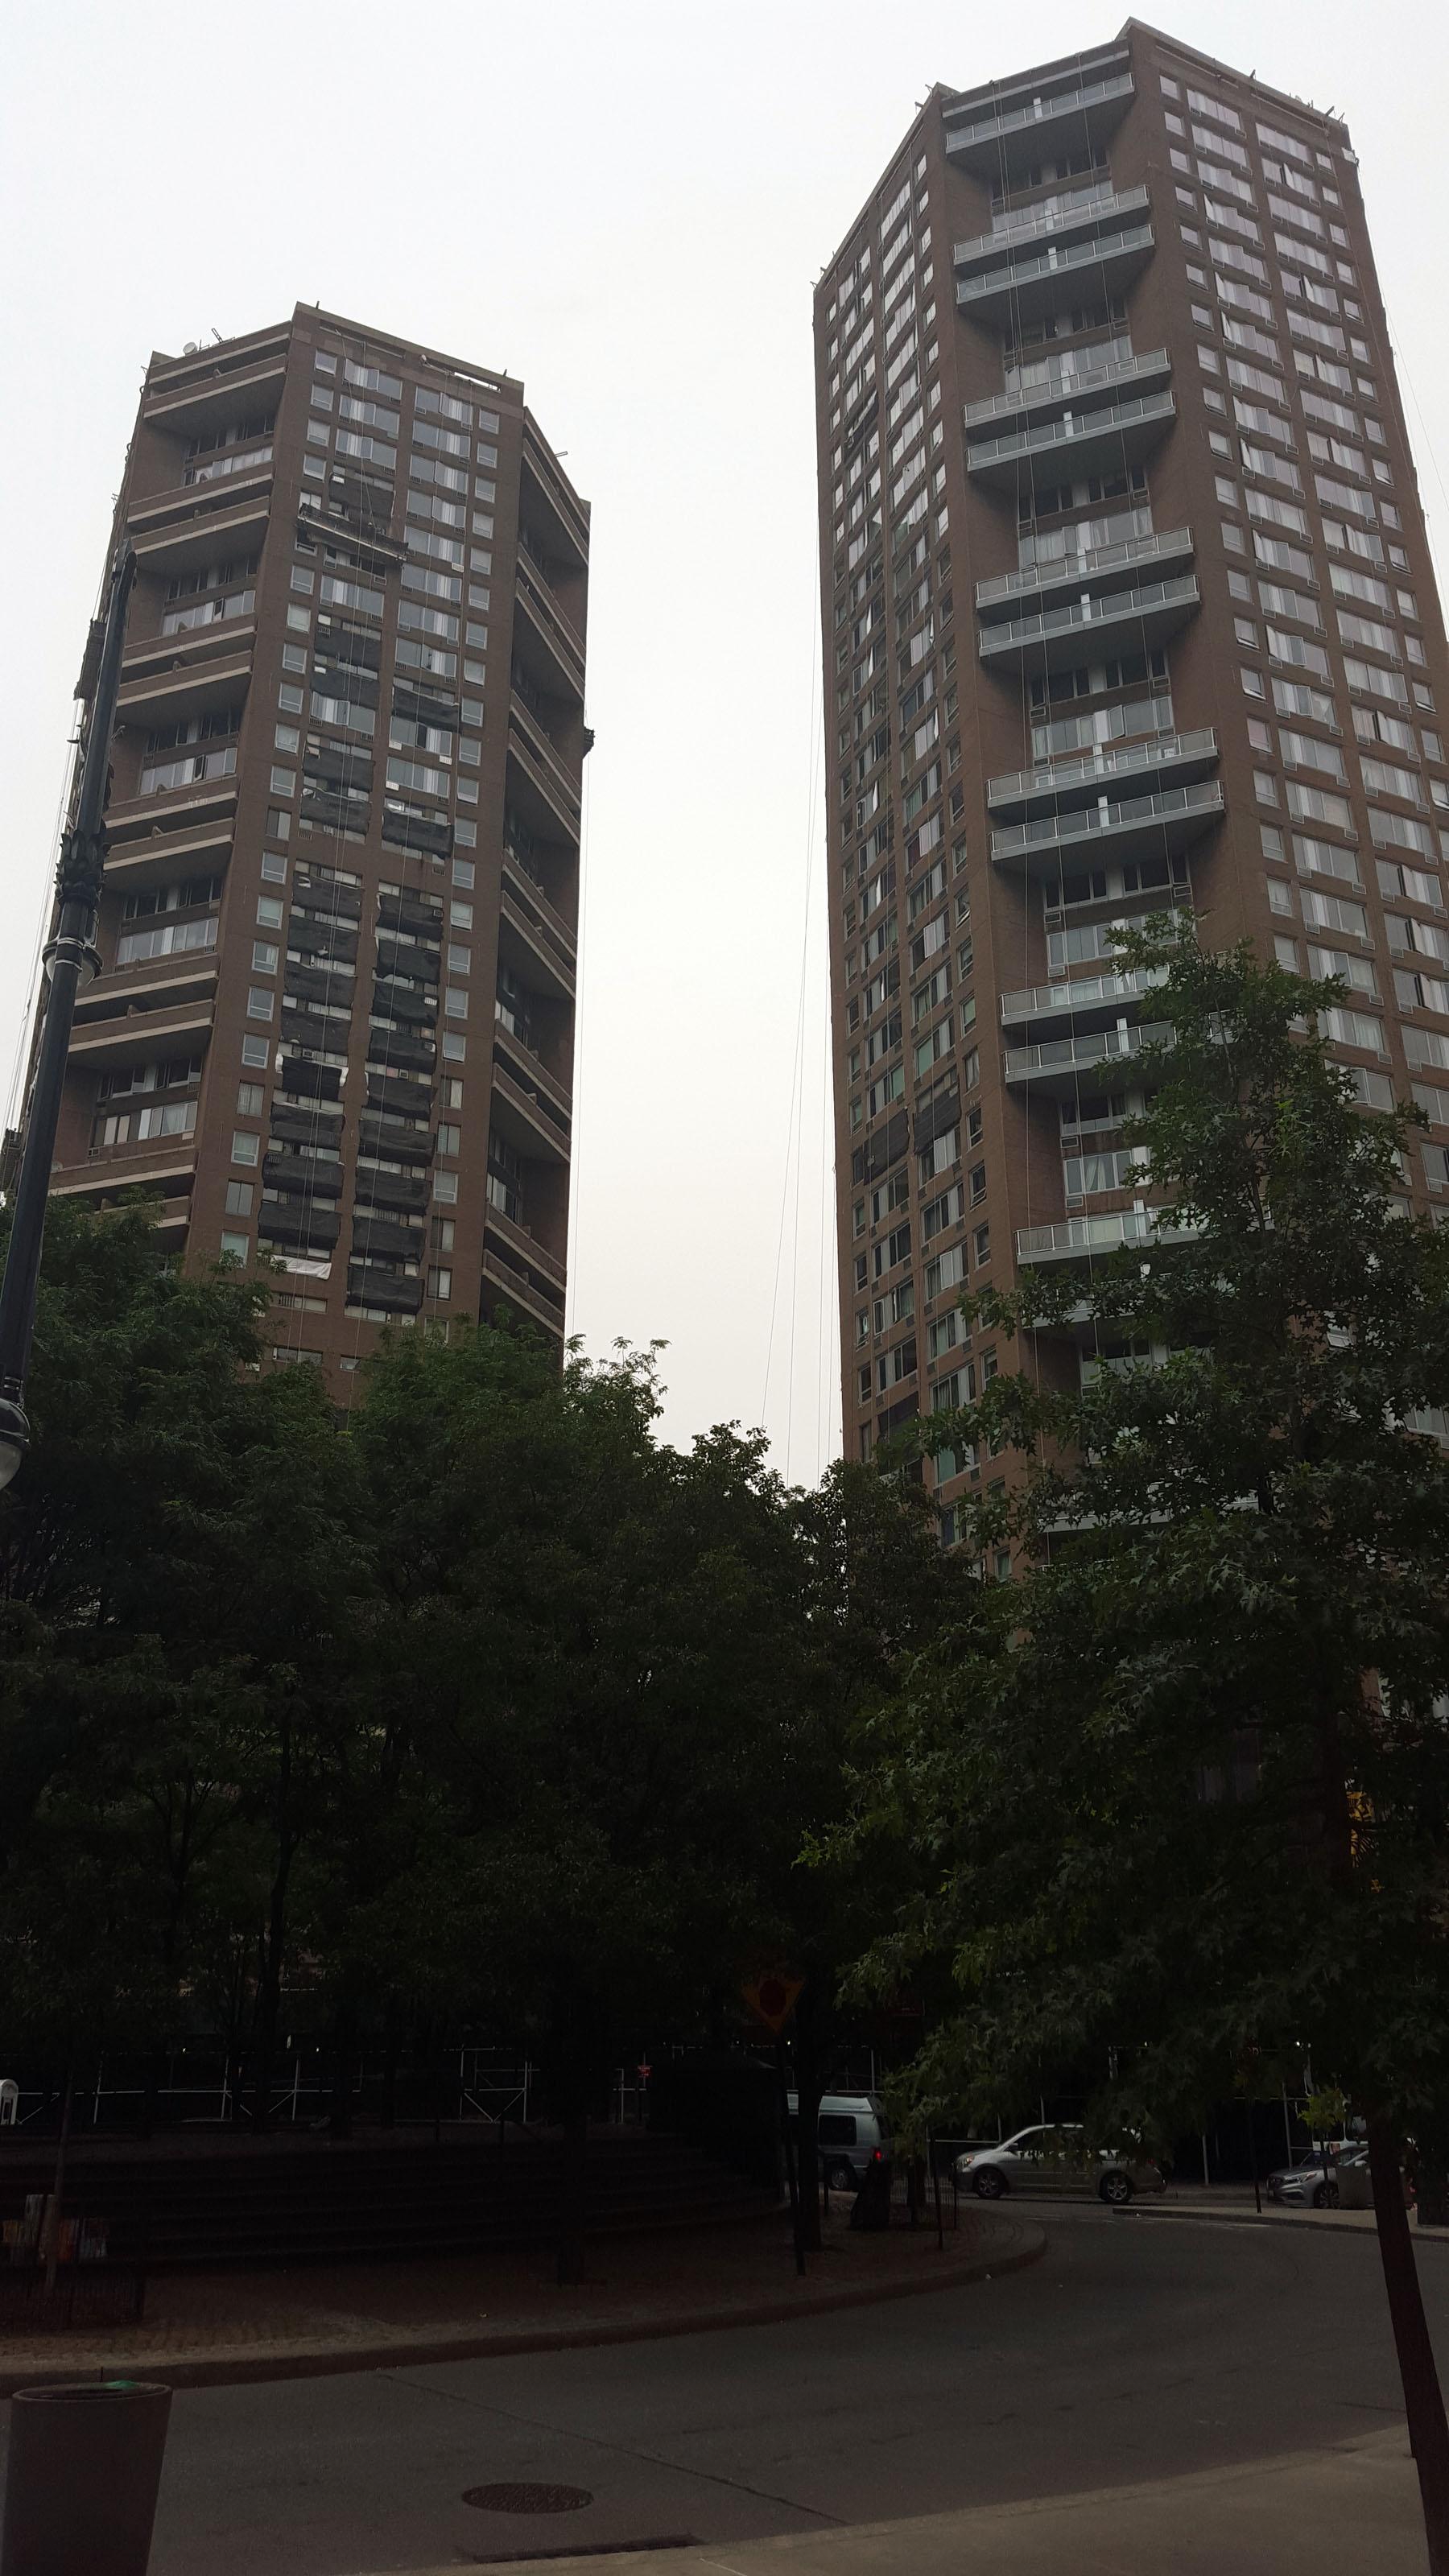 1295 Fifth Avenue